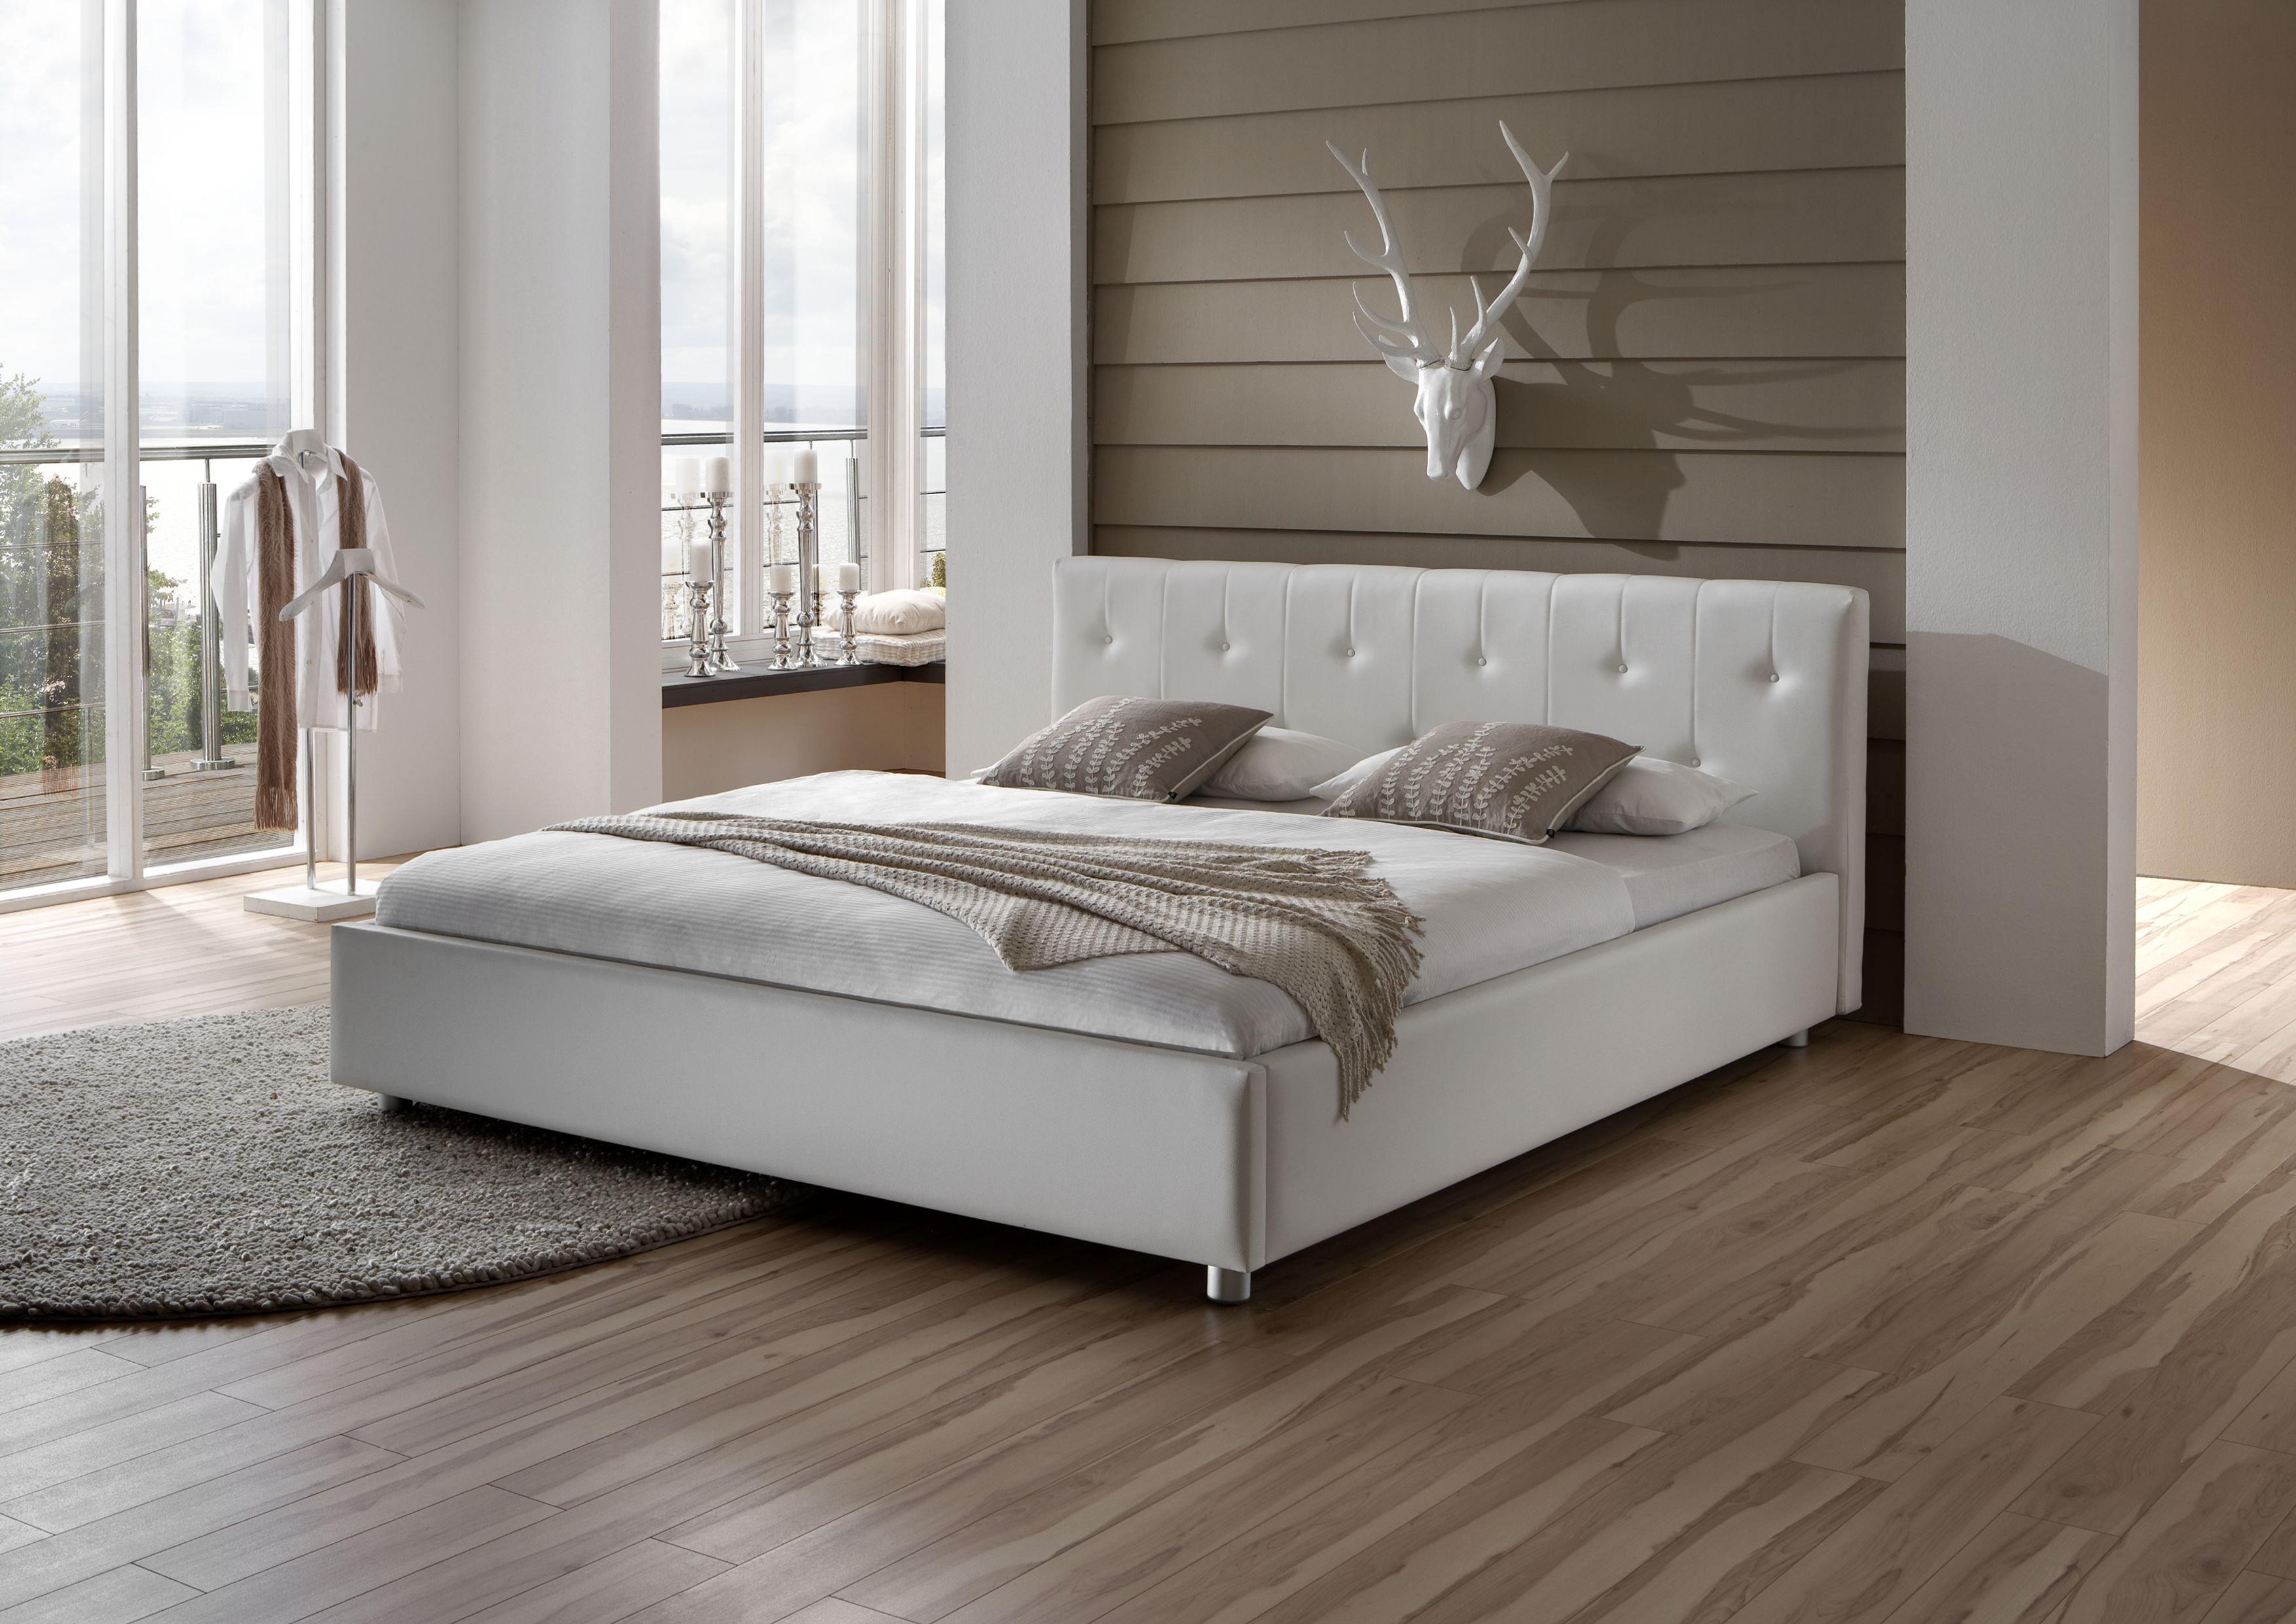 Dico Möbel Polsterbett 840.00 / Rom in Weiß | Möbel Letz - Ihr ...